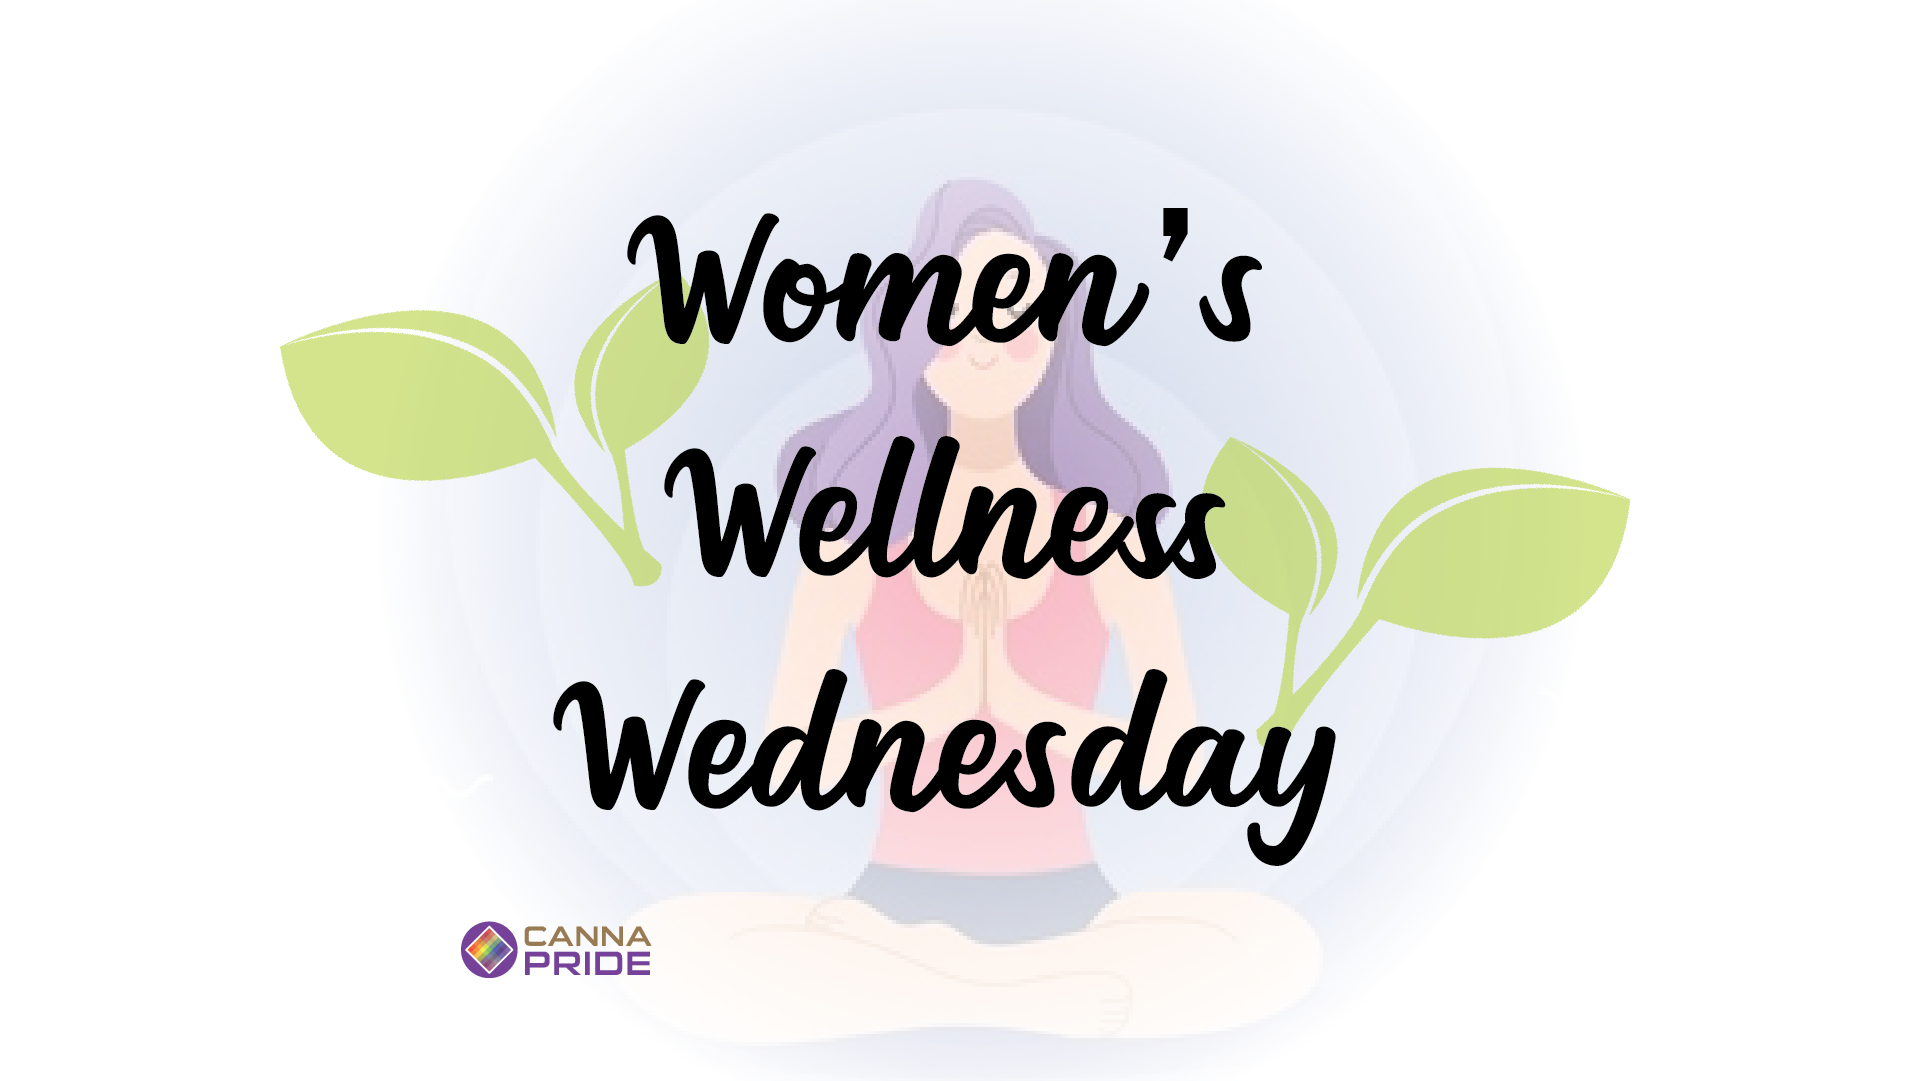 Women's Wellness Wednesday